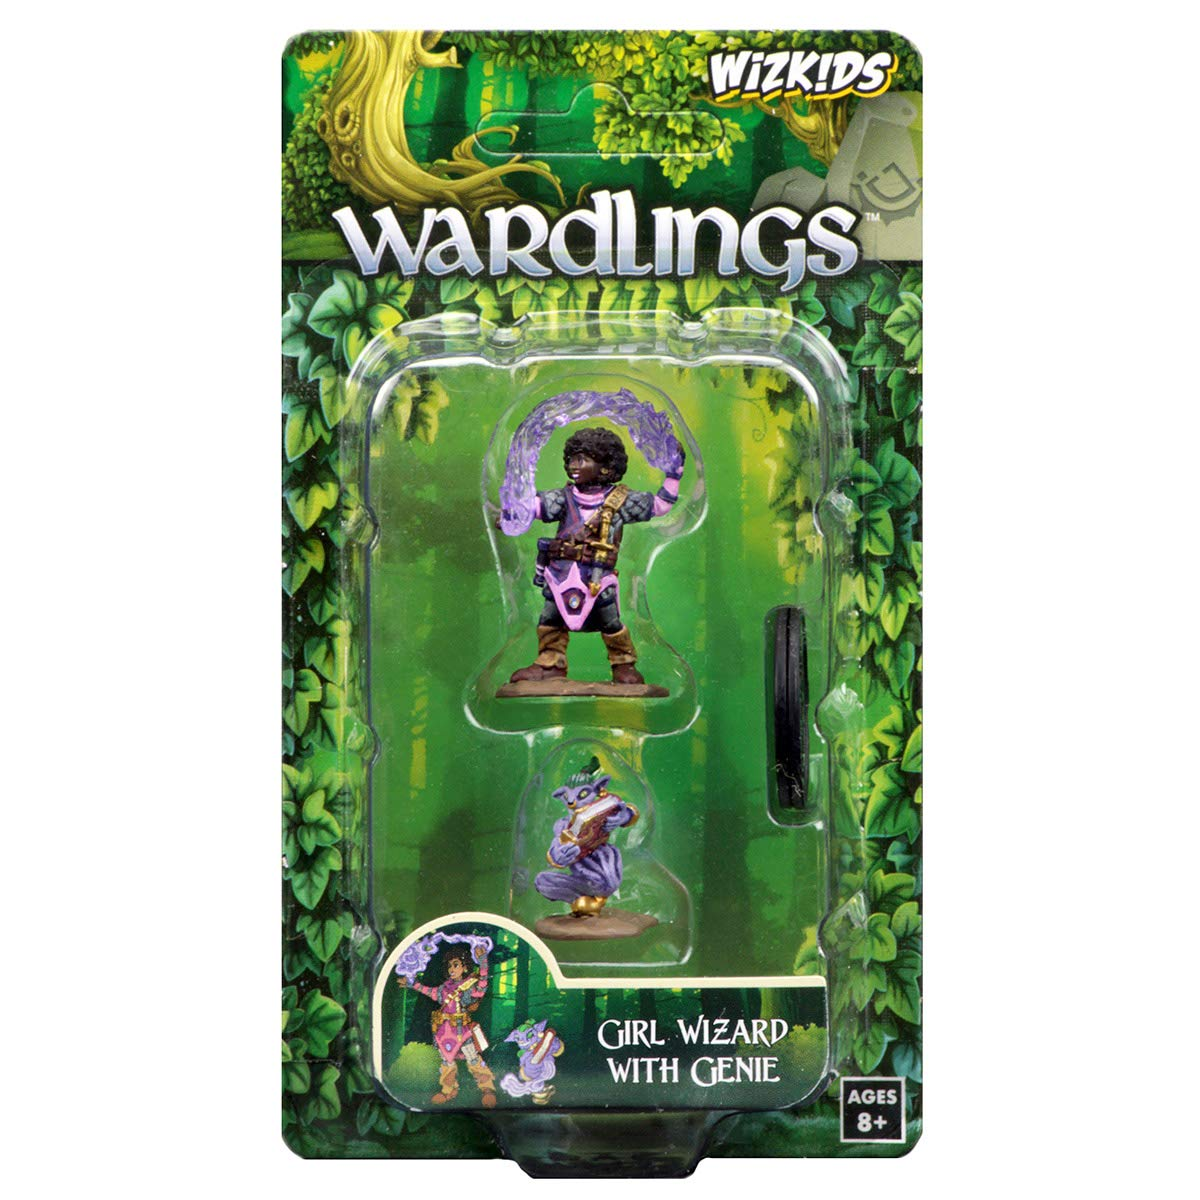 WizKids Wardlings RPG Figures Girl Wizard /& Genie WZK73323